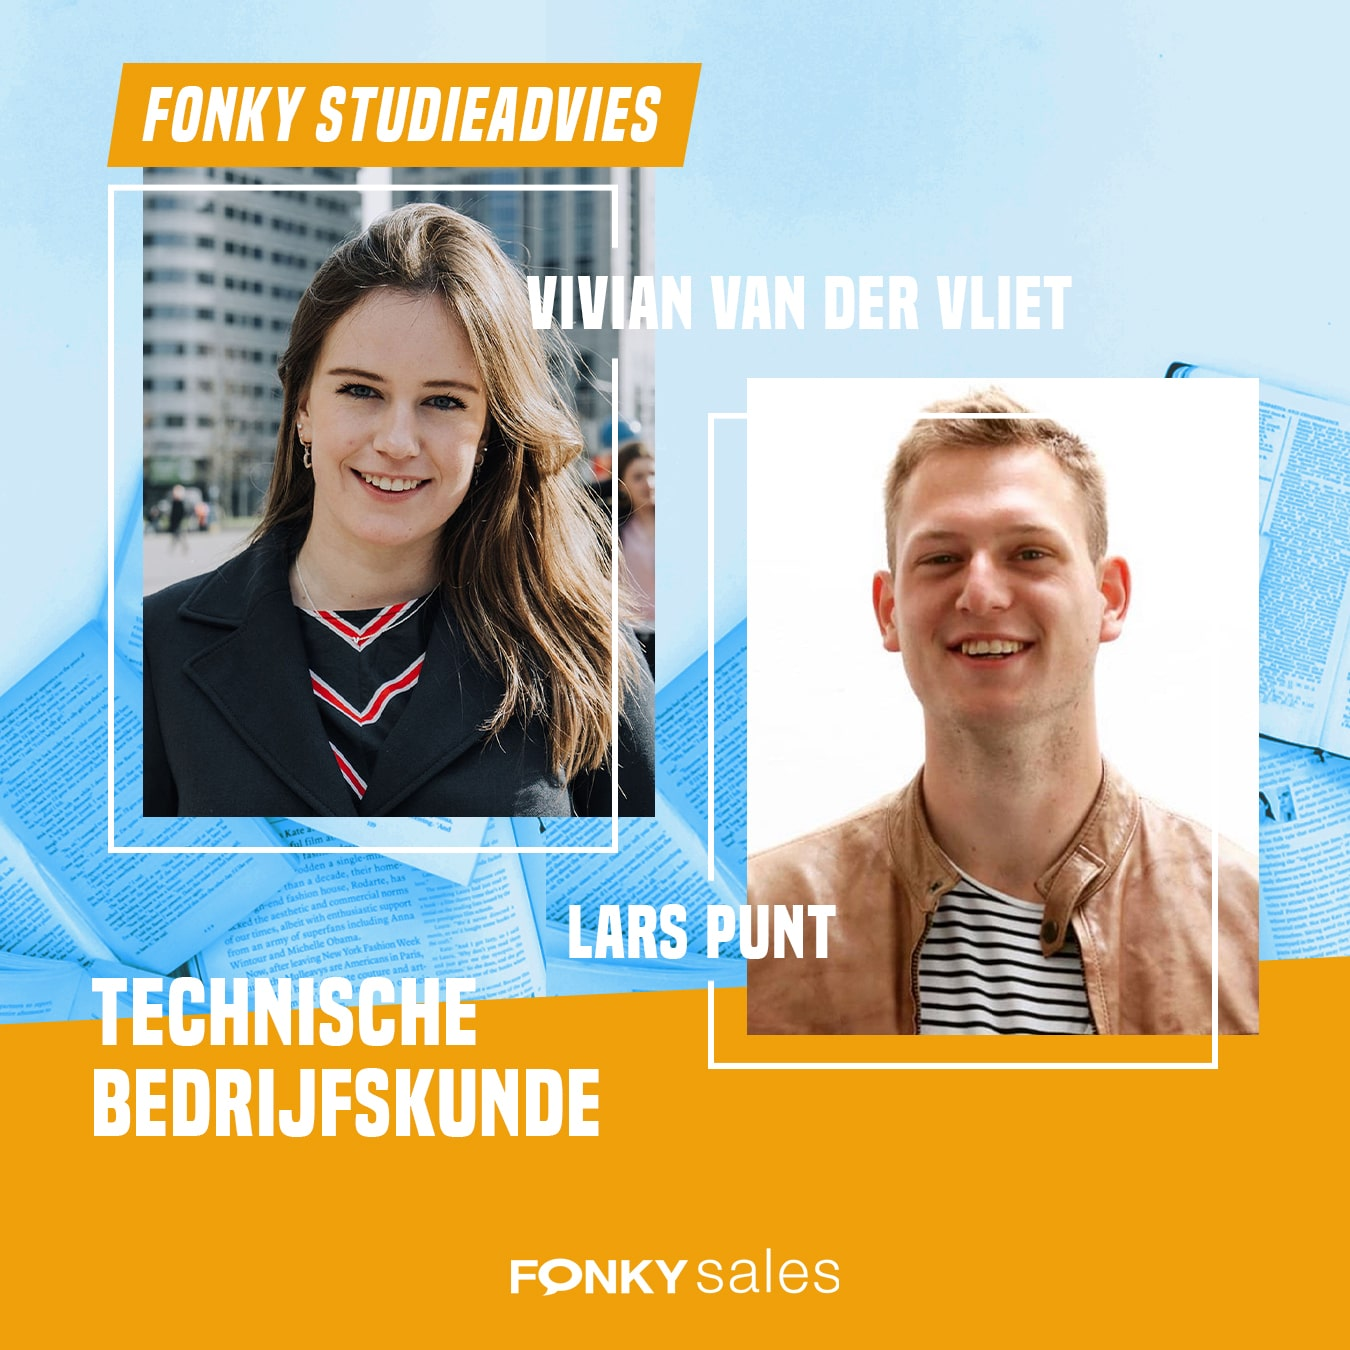 Fonky Studieadvies Vivian en Lars